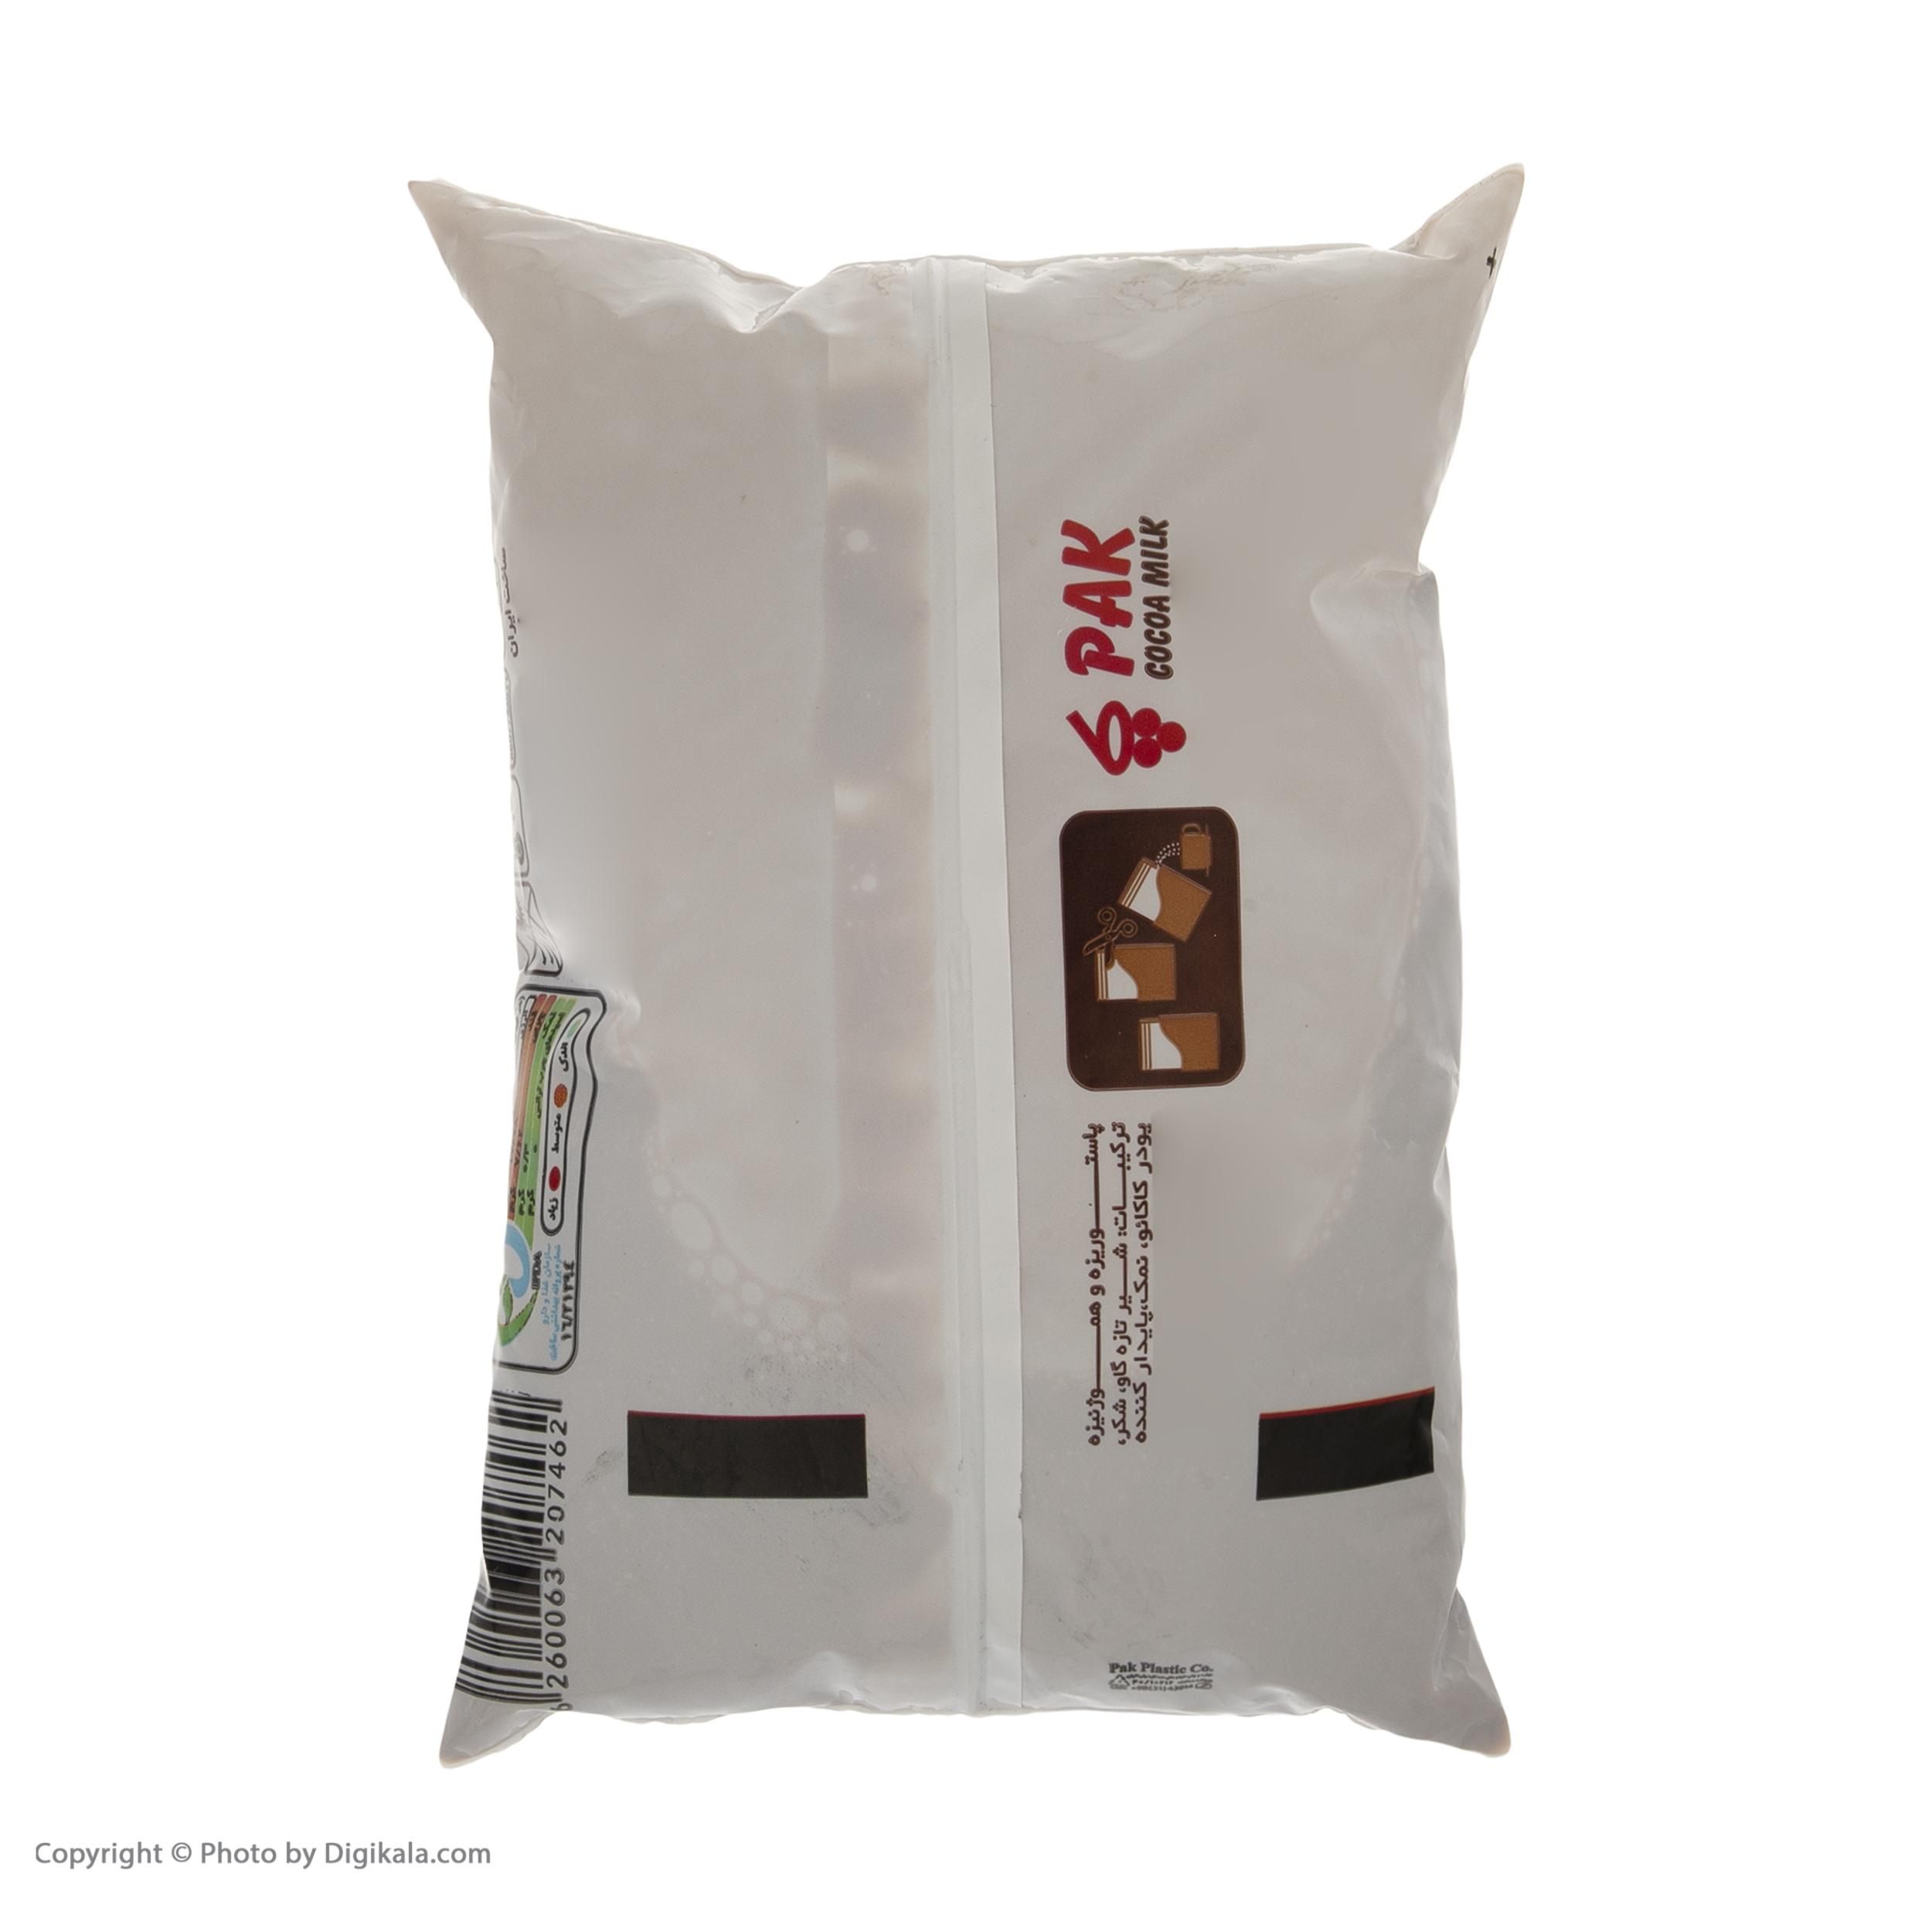 شیر کاکائو پاک - 750 میلی لیتر